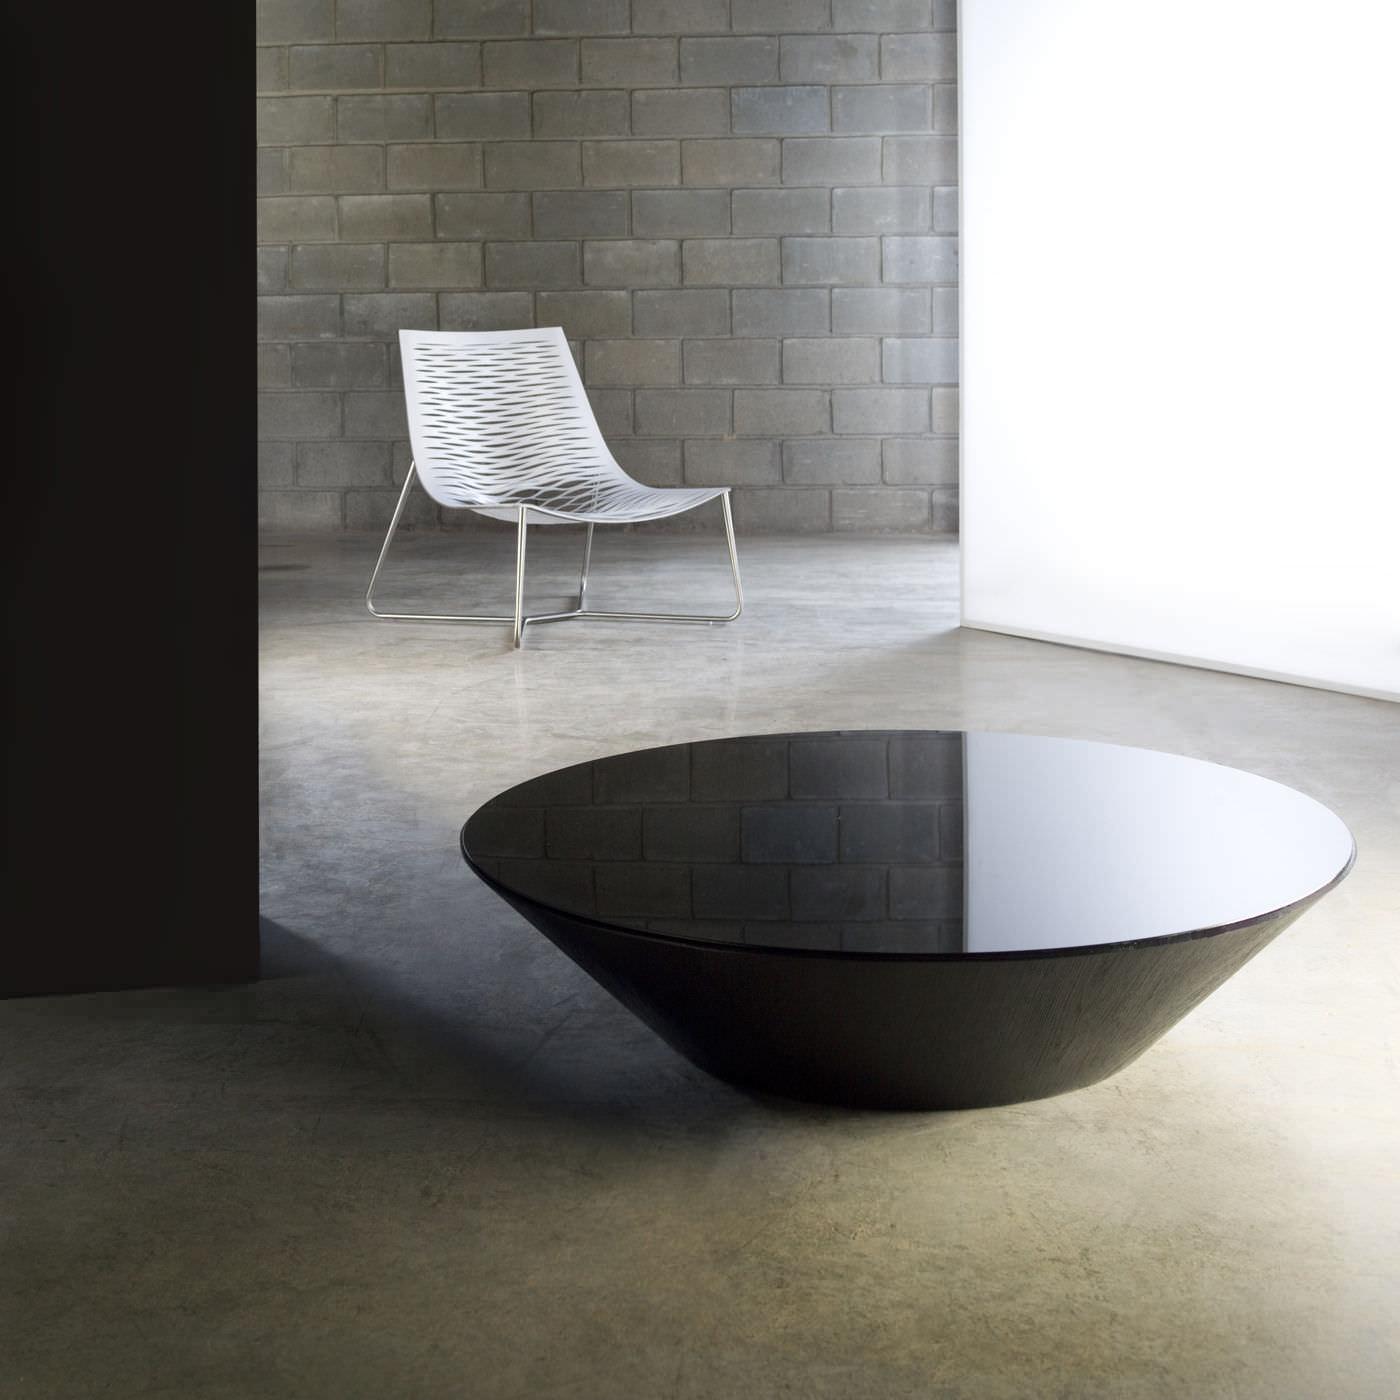 Contemporary Coffee Table Glass Round Dorset Modloft in size 1400 X 1400